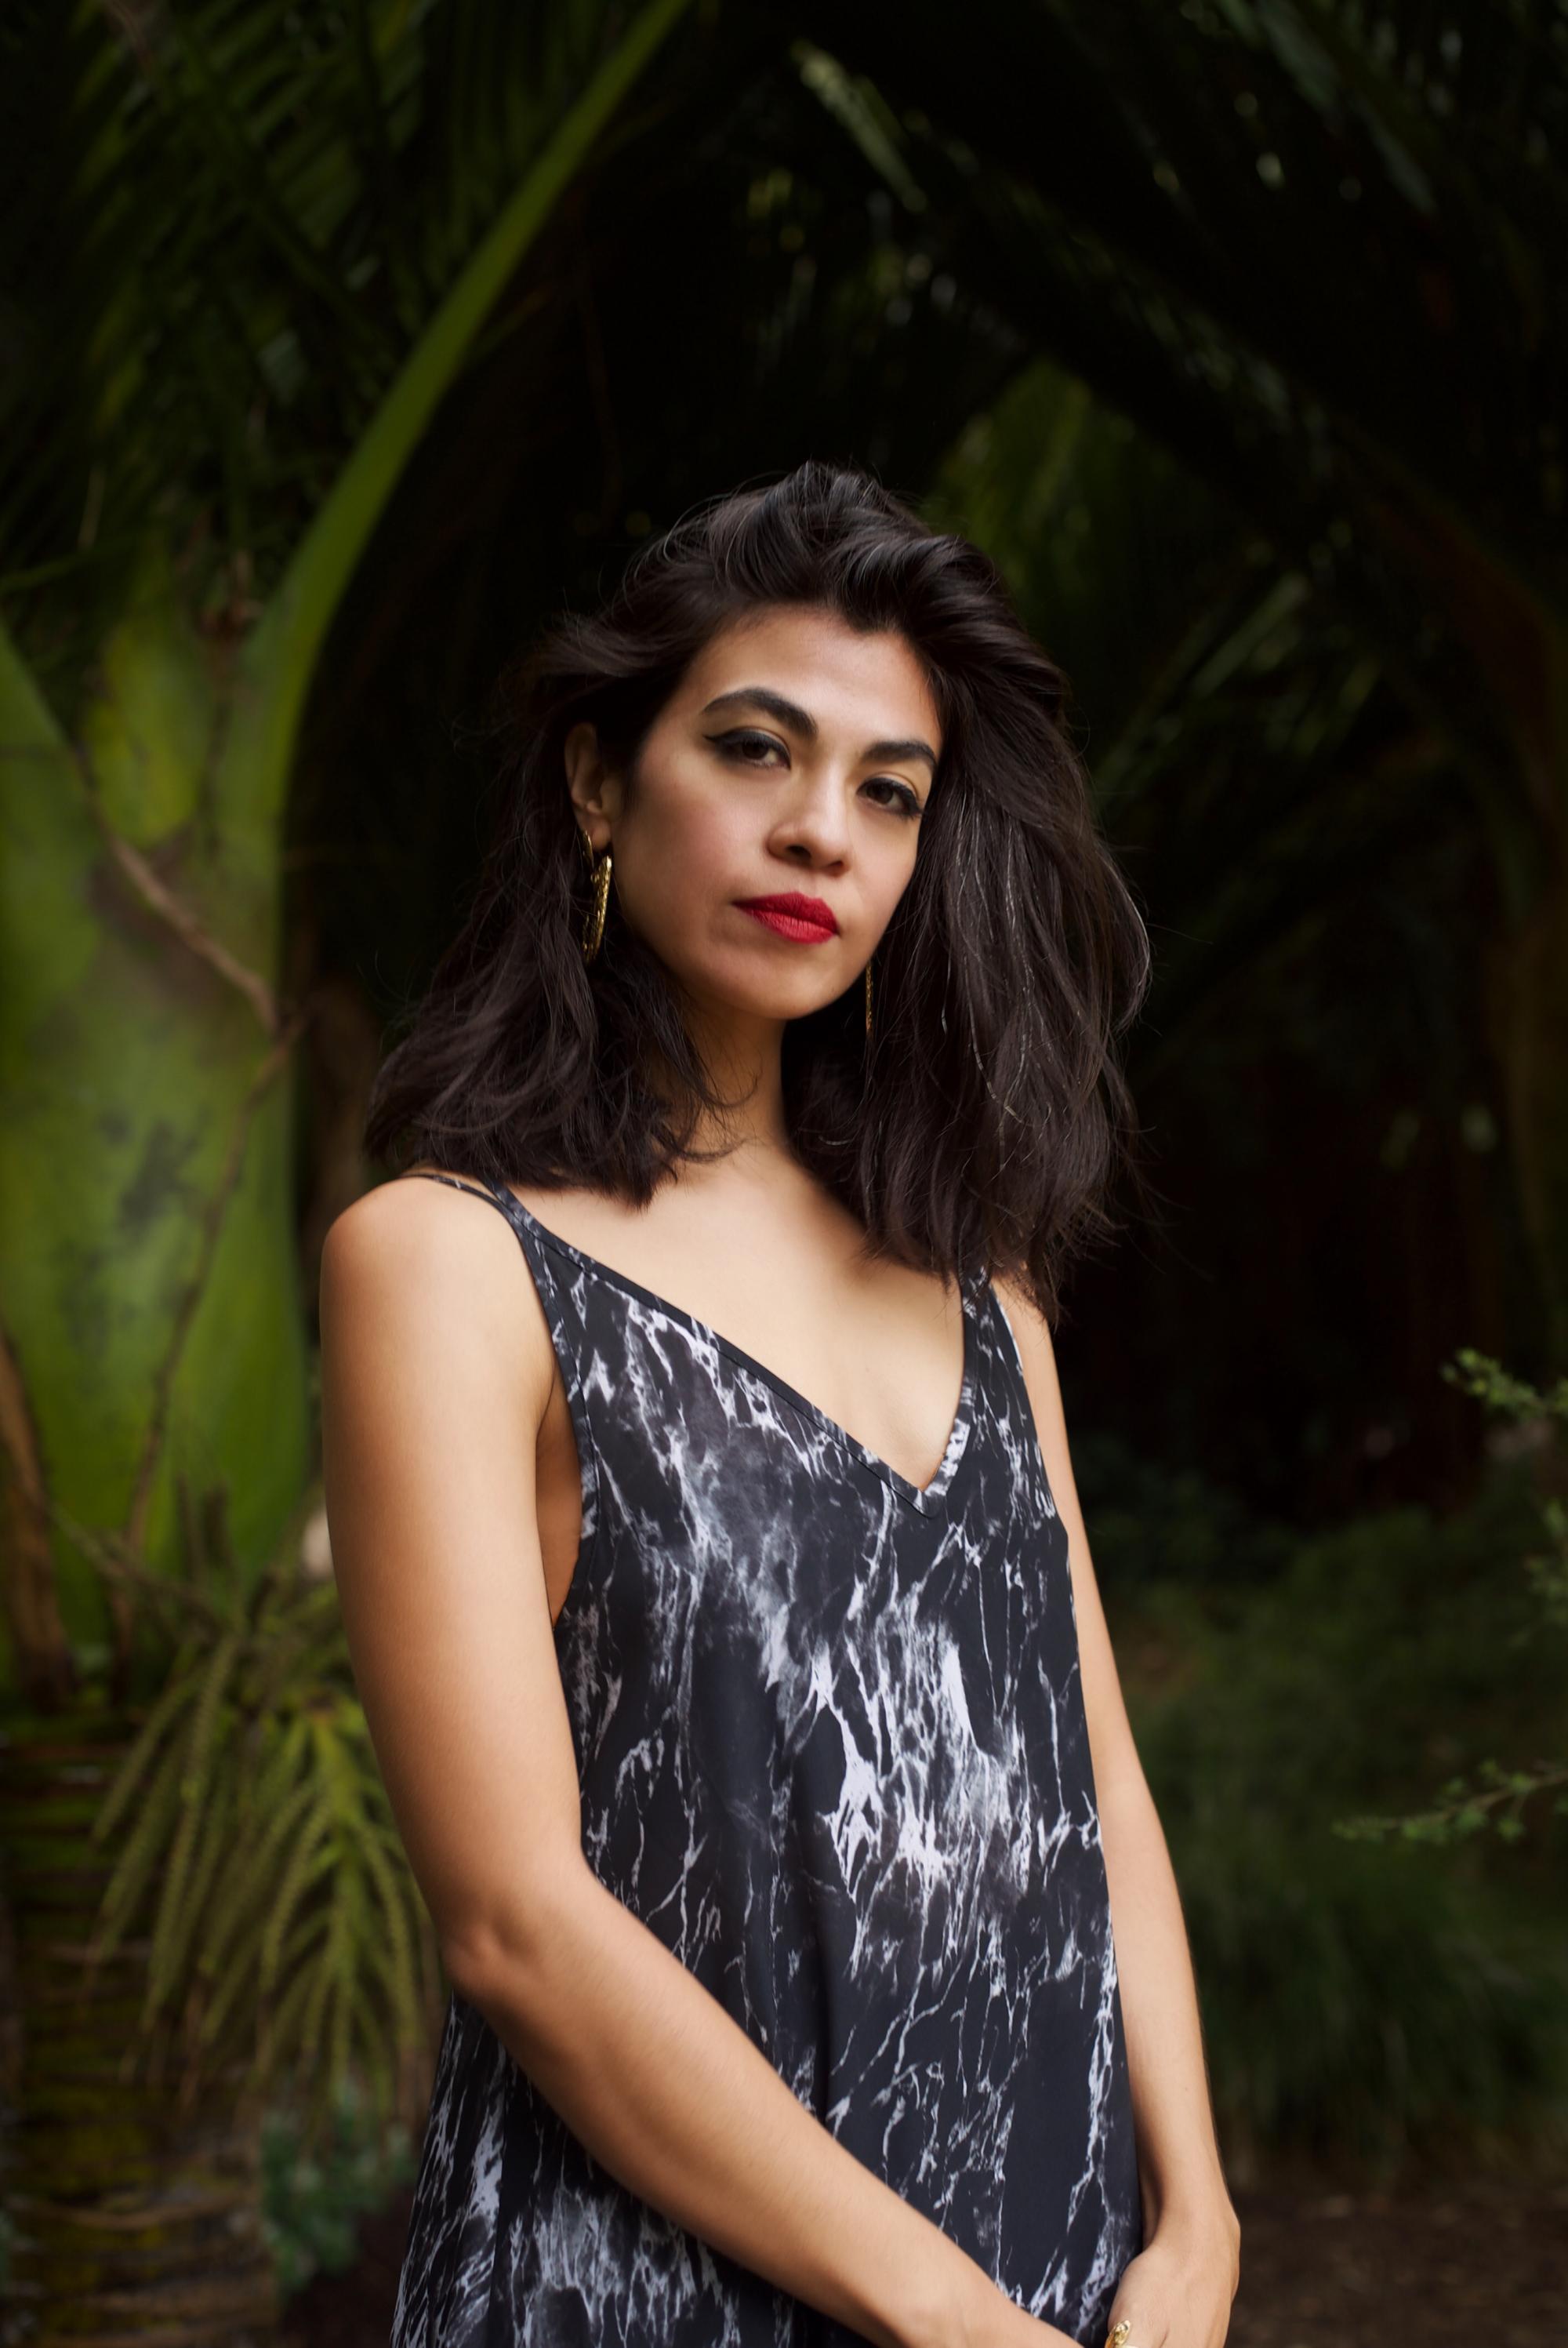 Photo of Ingrid Rojas Contreras